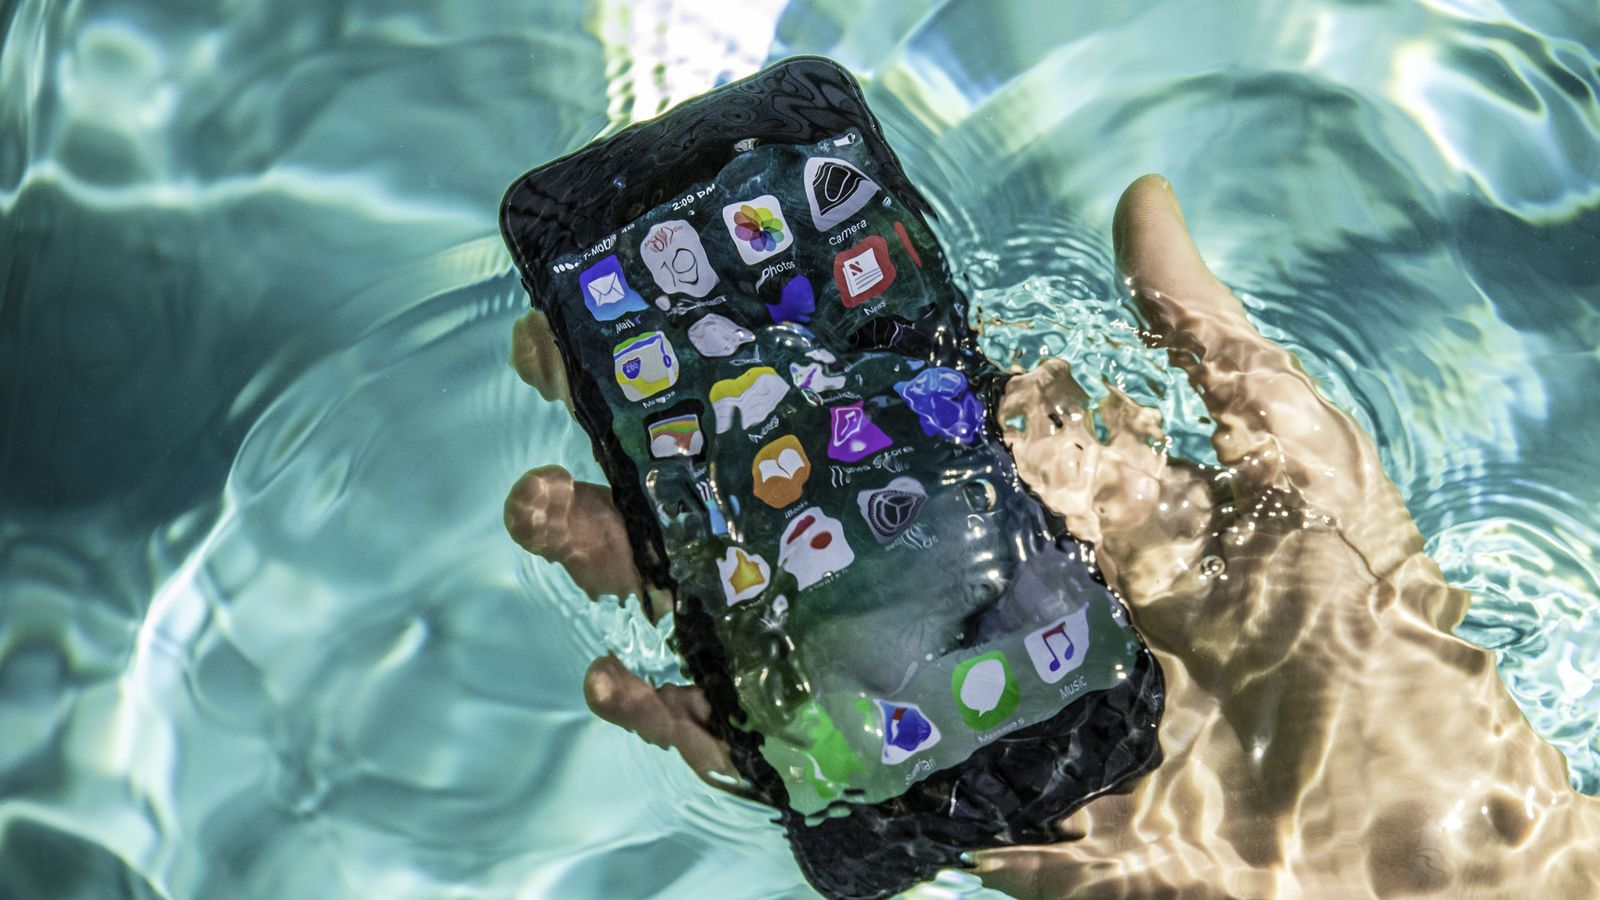 online store dc0ad 2fe07 Phone Water Damage Repair Leeds | iPhone Repair Leeds